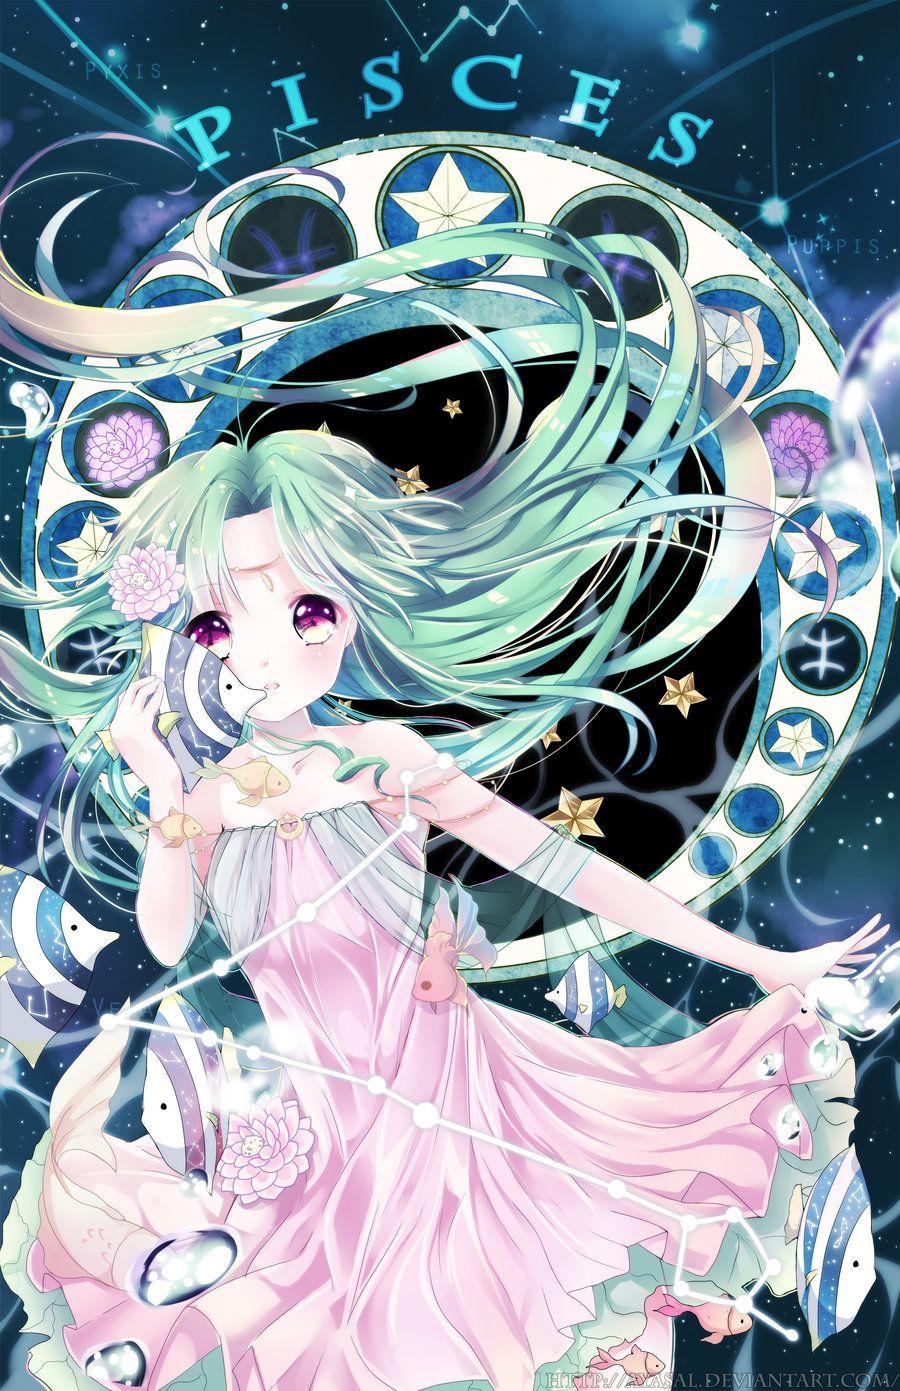 Anime Art, Manga Anime, Manga Art, Anime Mangas, Anime Horoscope, Anime